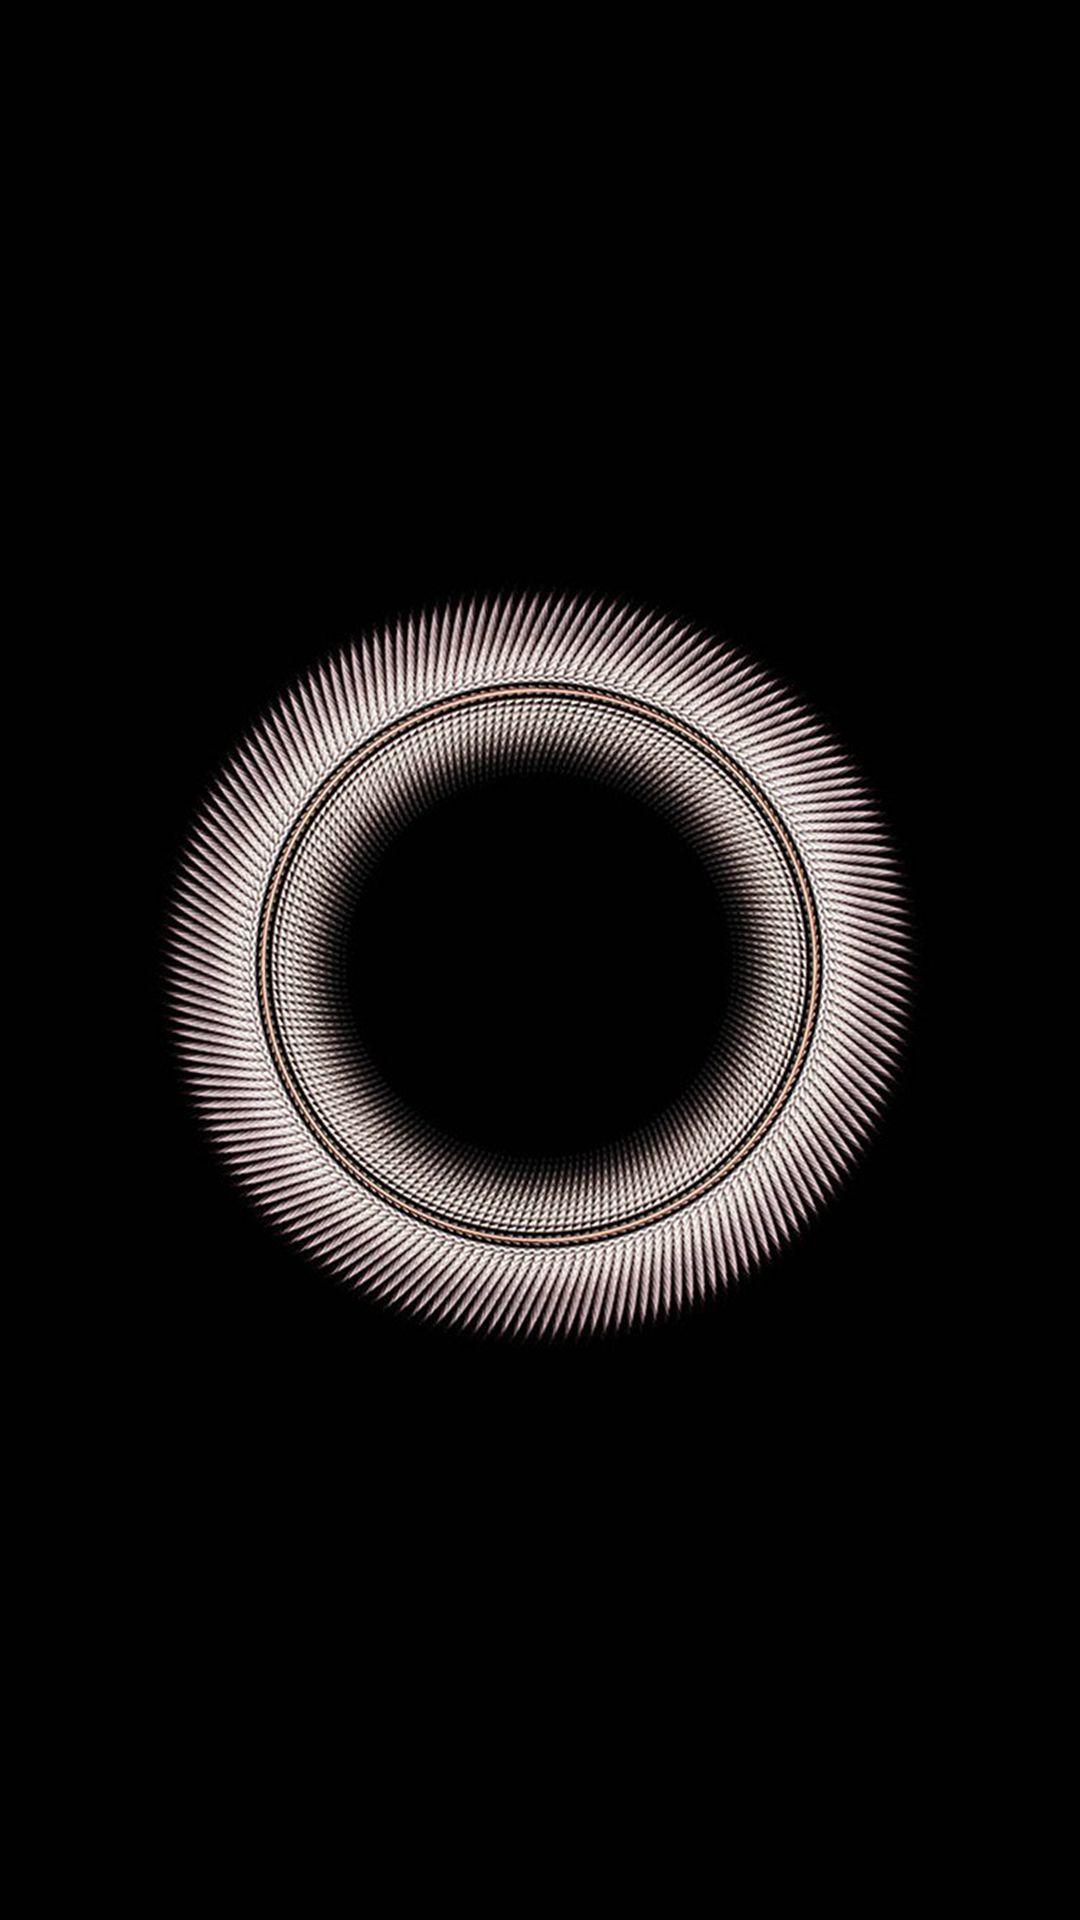 Circle Dark Inside Minimal Simple Pattern Background Iphone 8